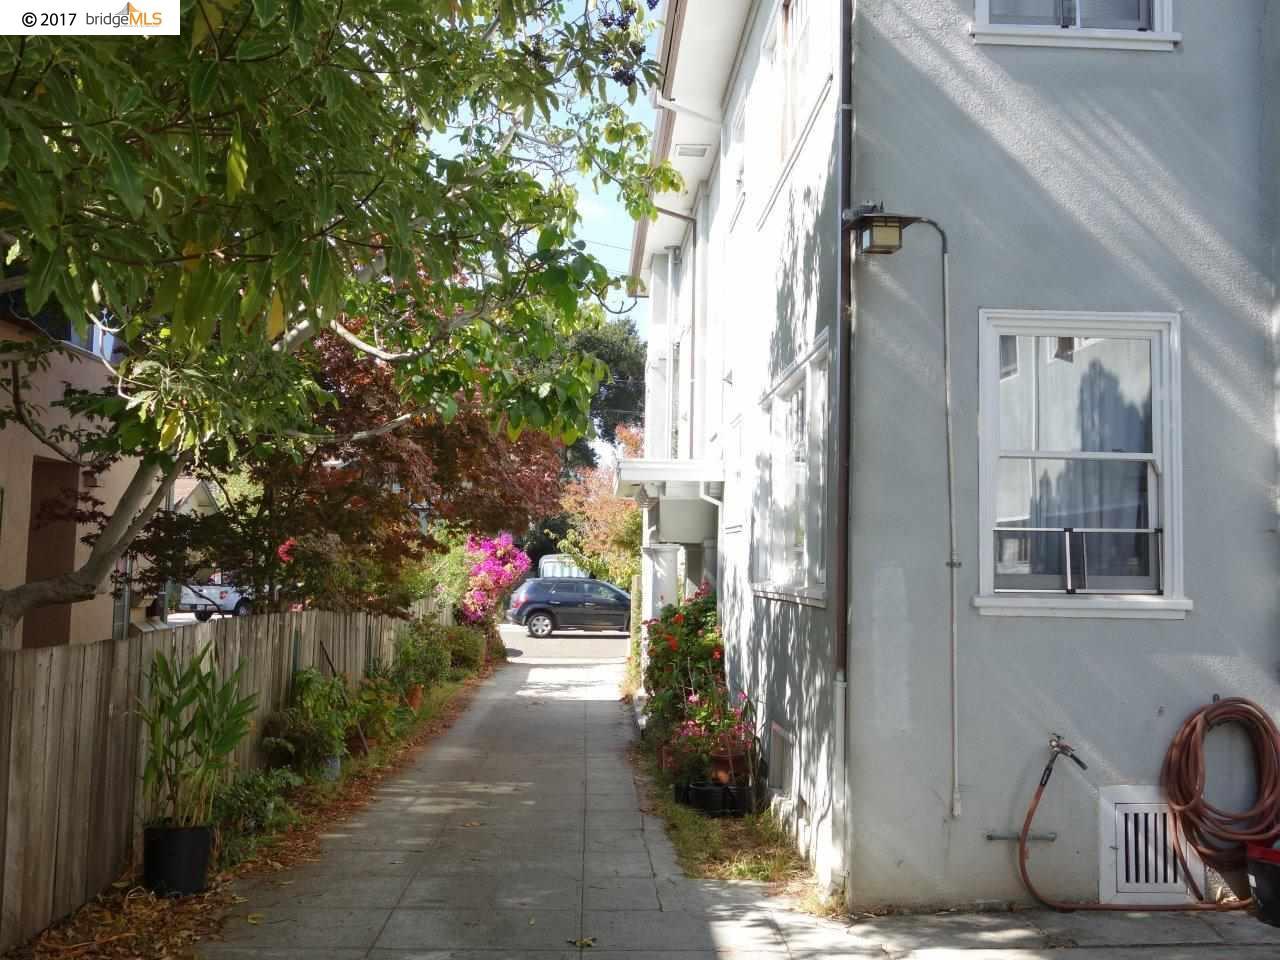 6426 BENVENUE AVENUE #4, OAKLAND, CA 94618  Photo 5